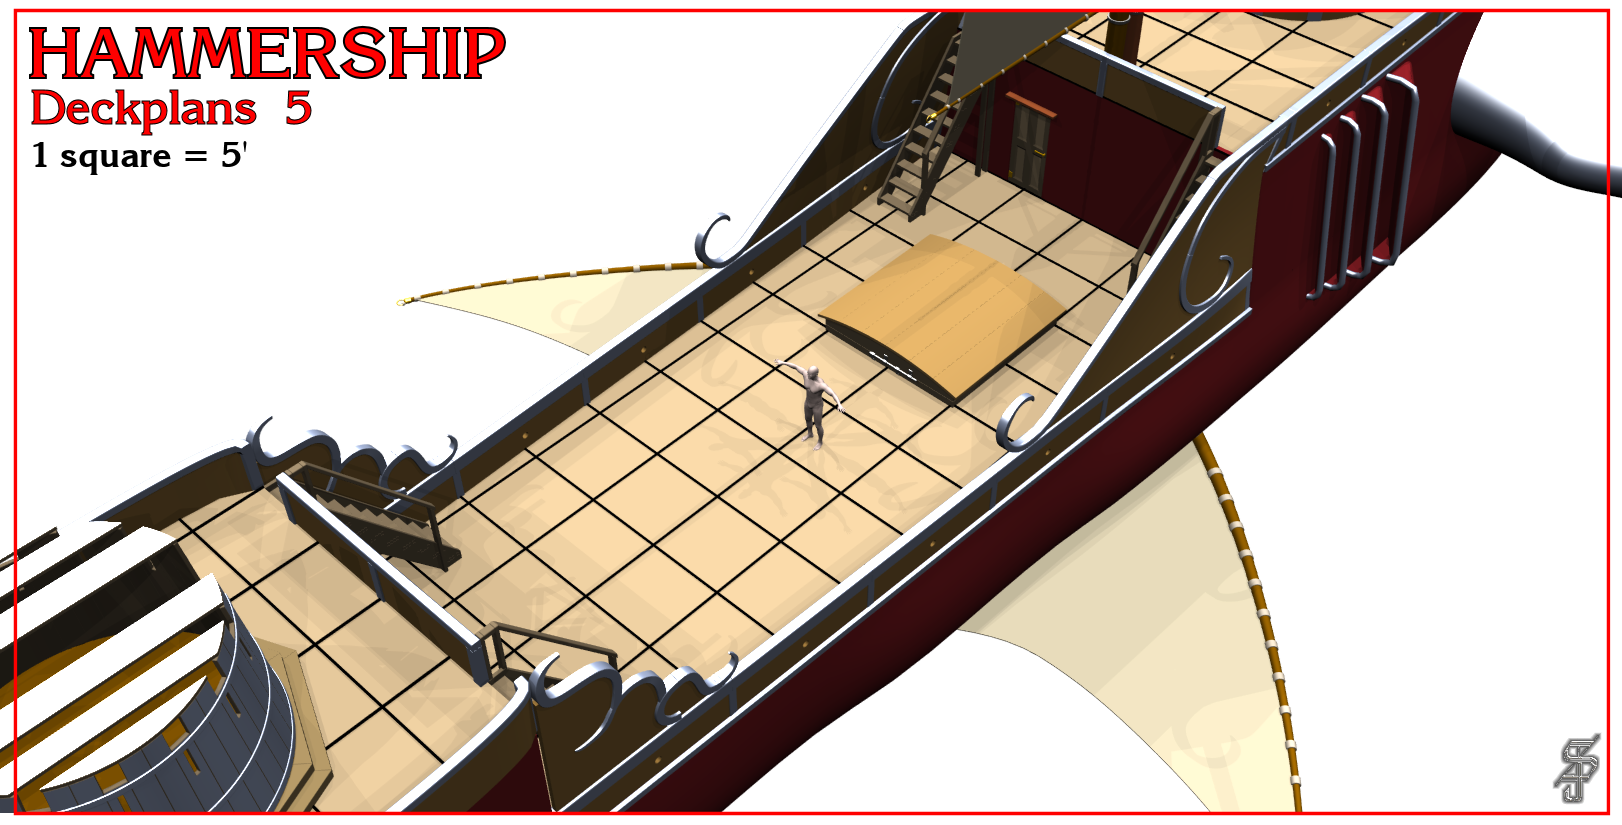 Hammership layout 5